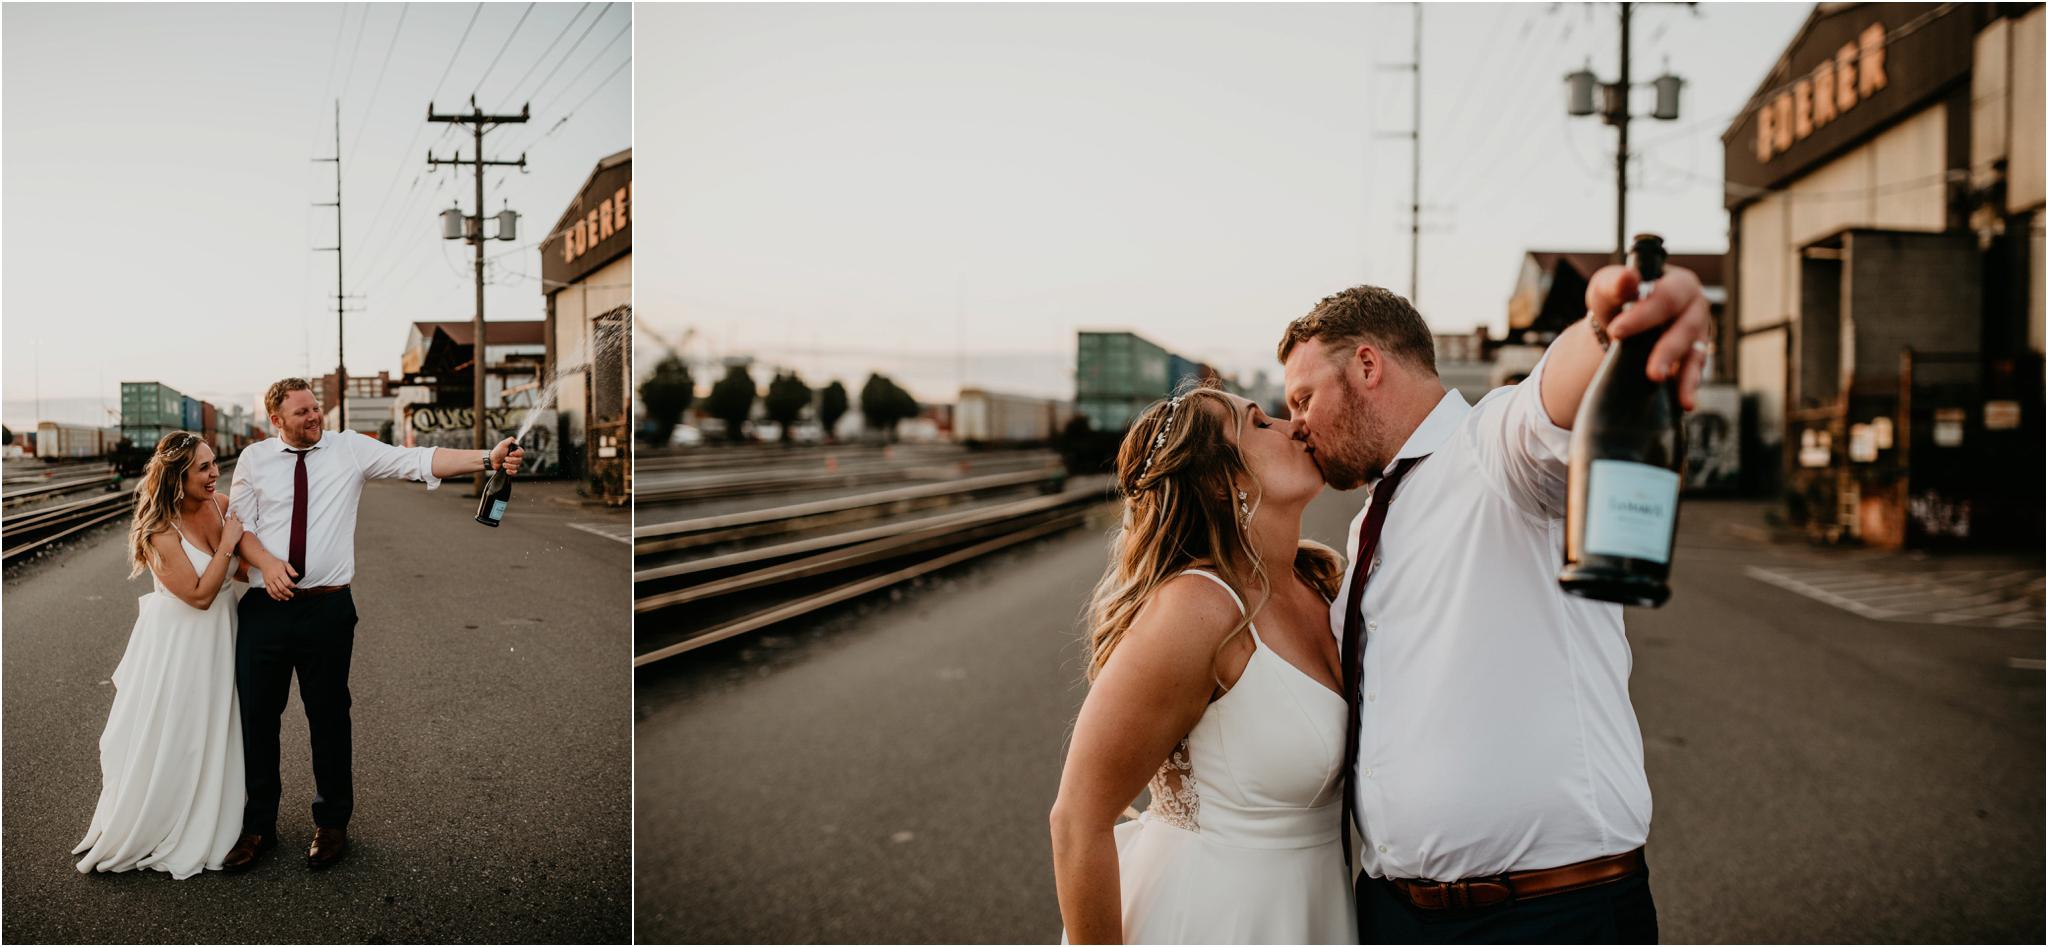 laura-and-matt-metropolist-urban-seattle-wedding-photographer-159.jpg